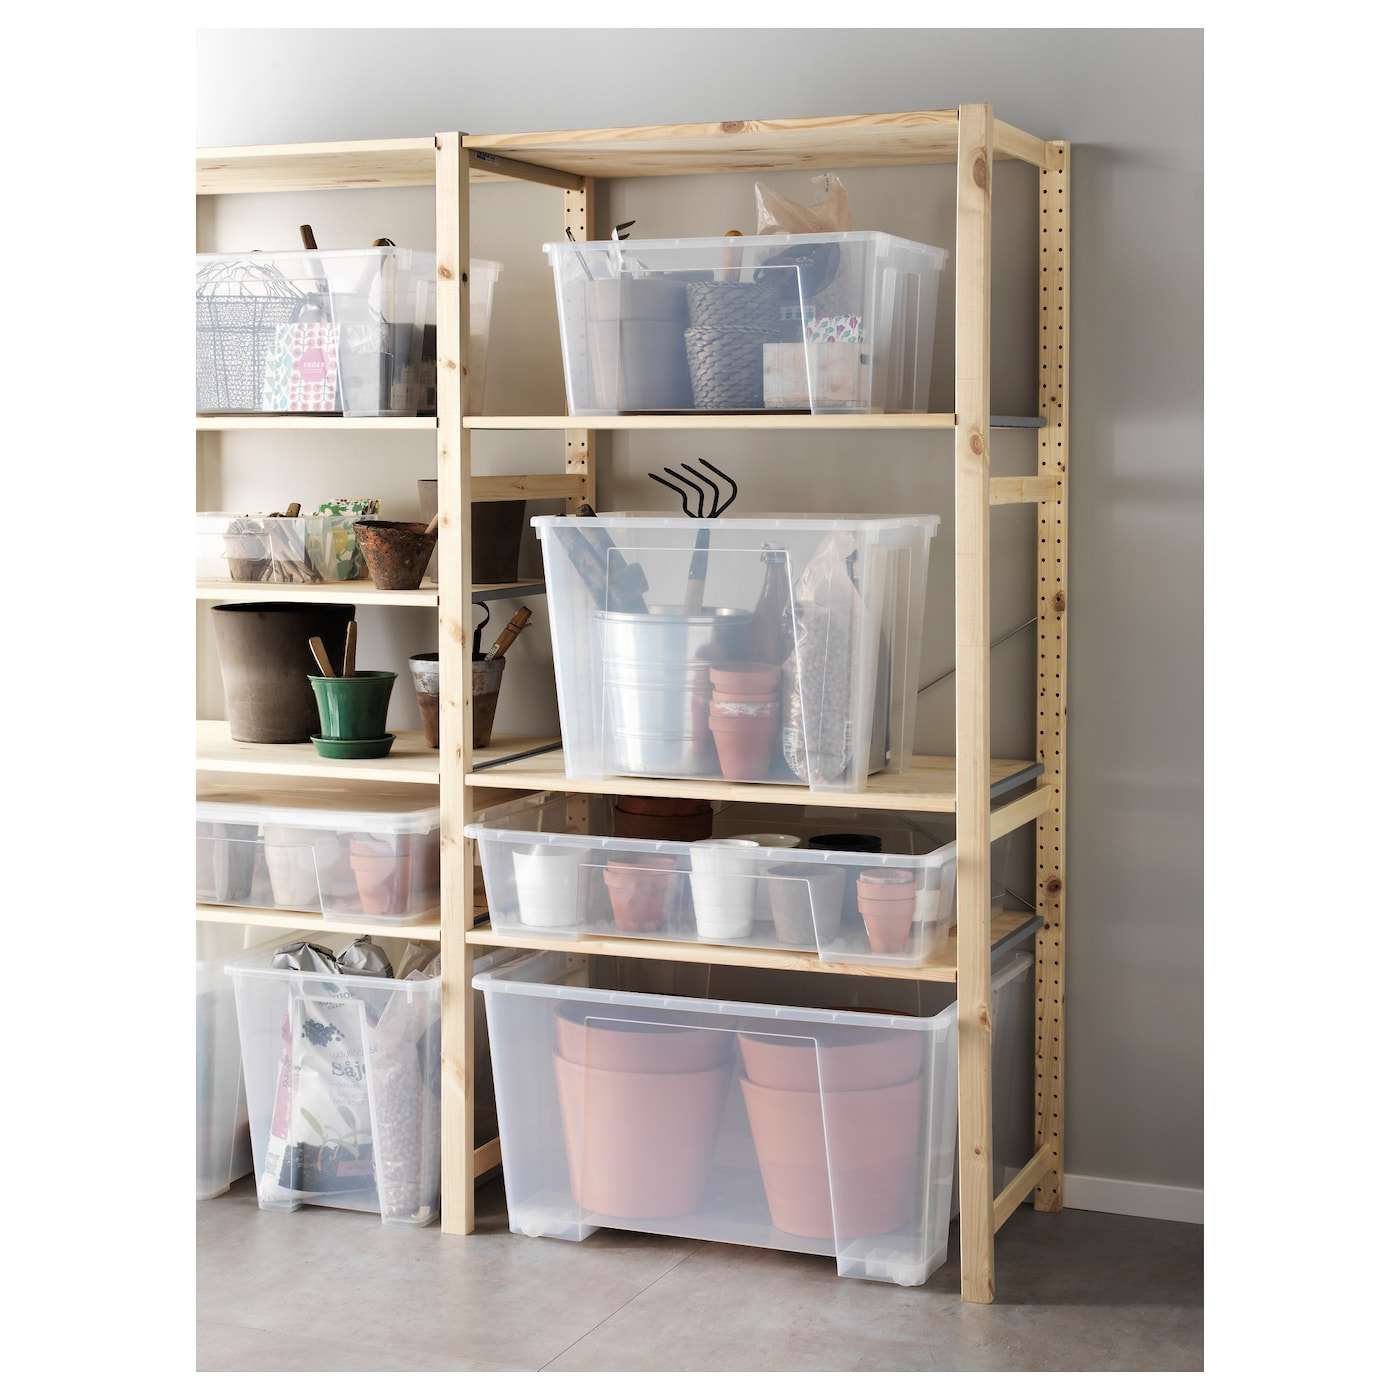 mounted brackets piece in knape vogt white w box shadow d wt shelves decorative p shelf kit x wall